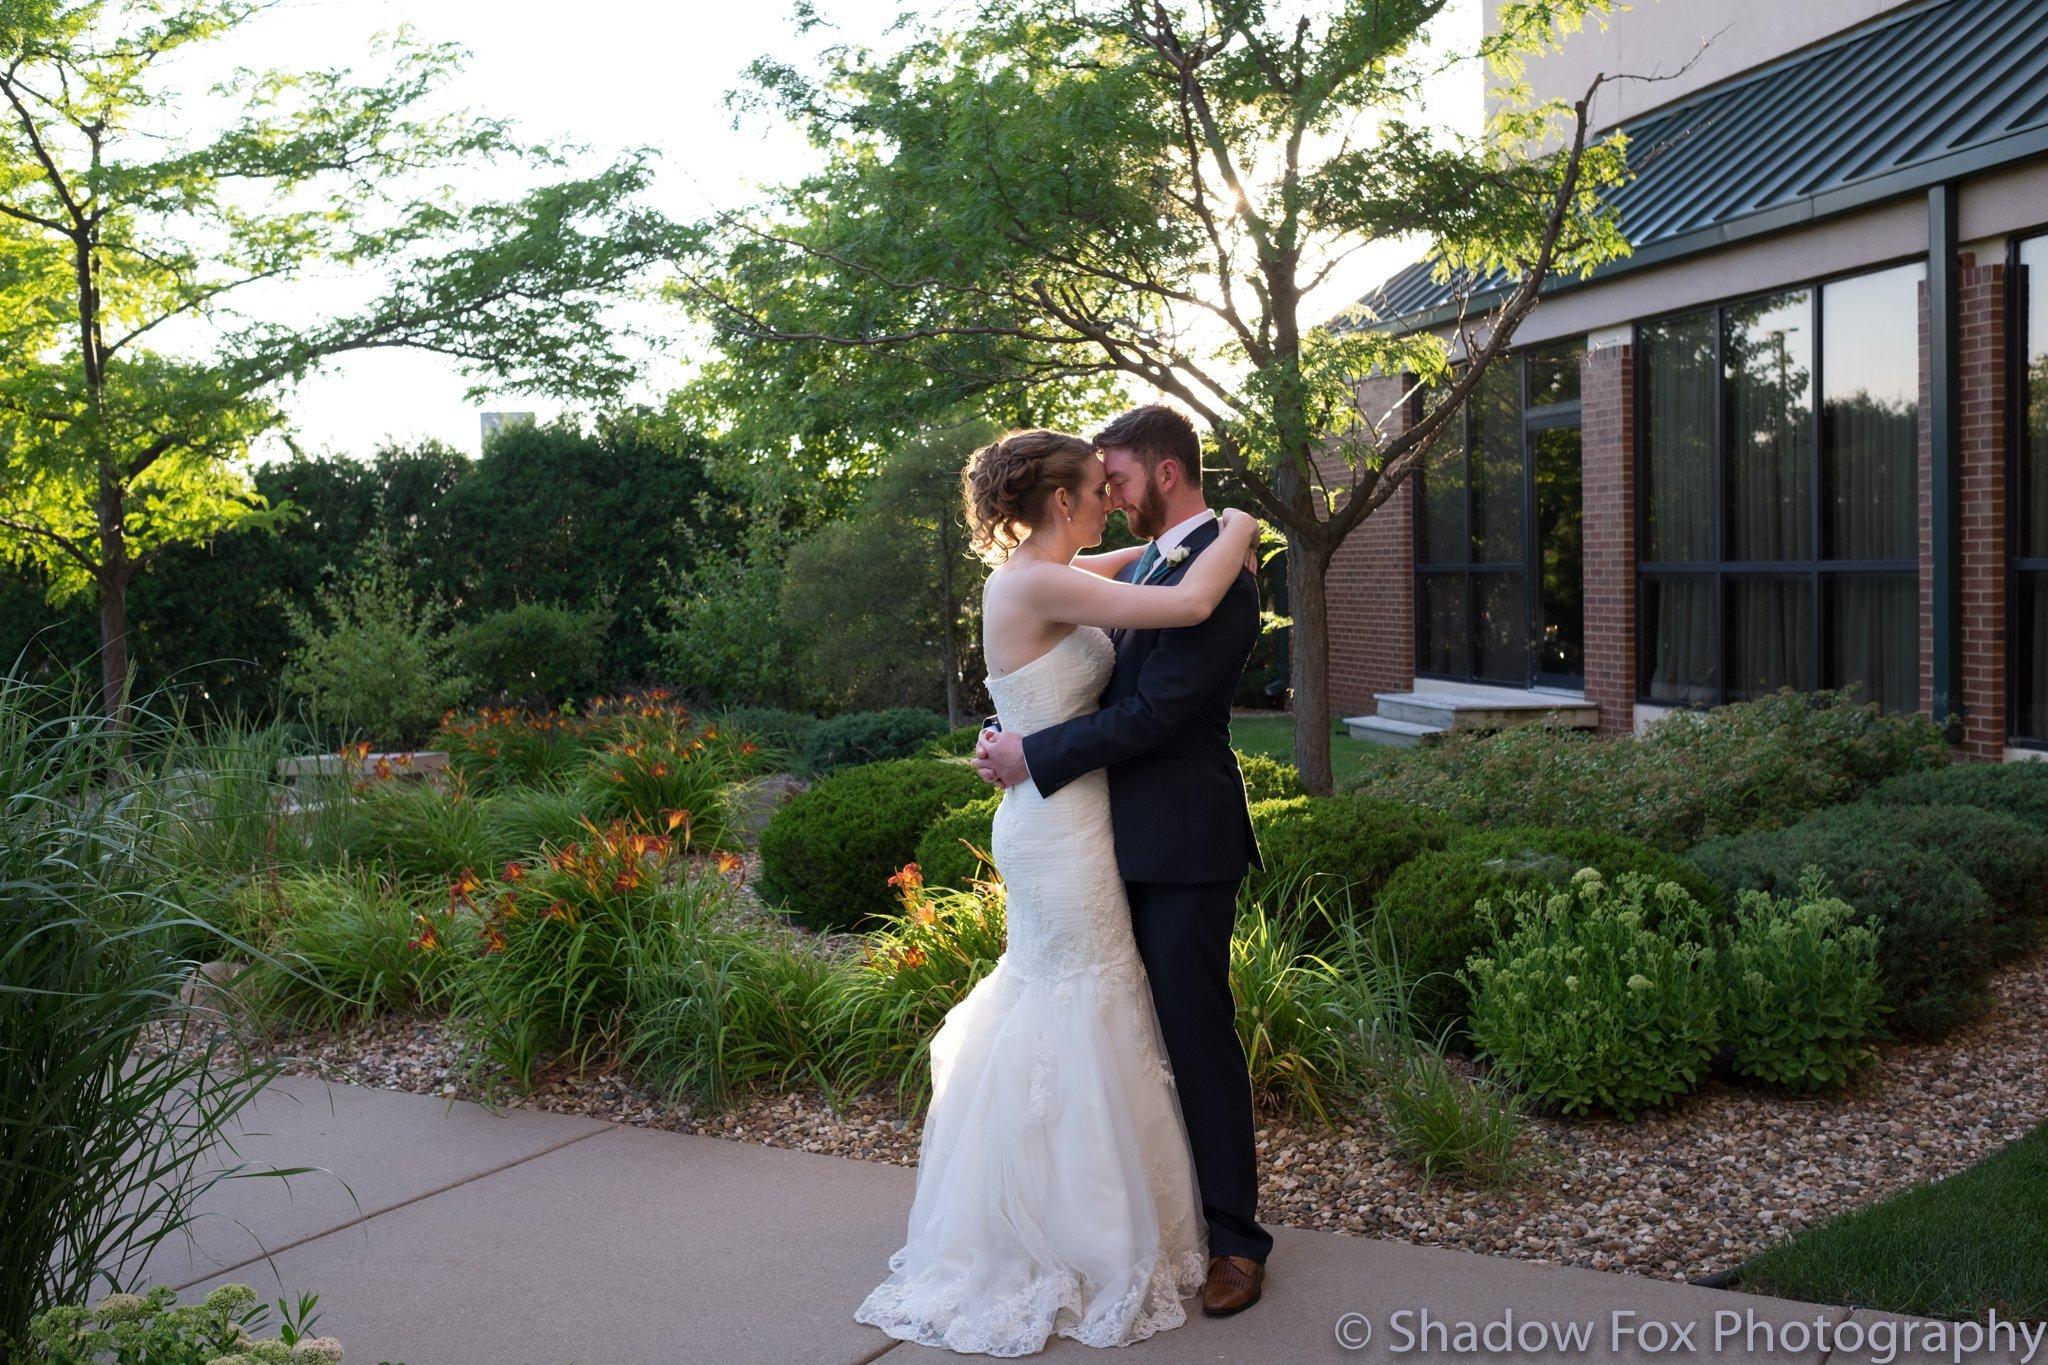 Wedding portrait photography outdoors